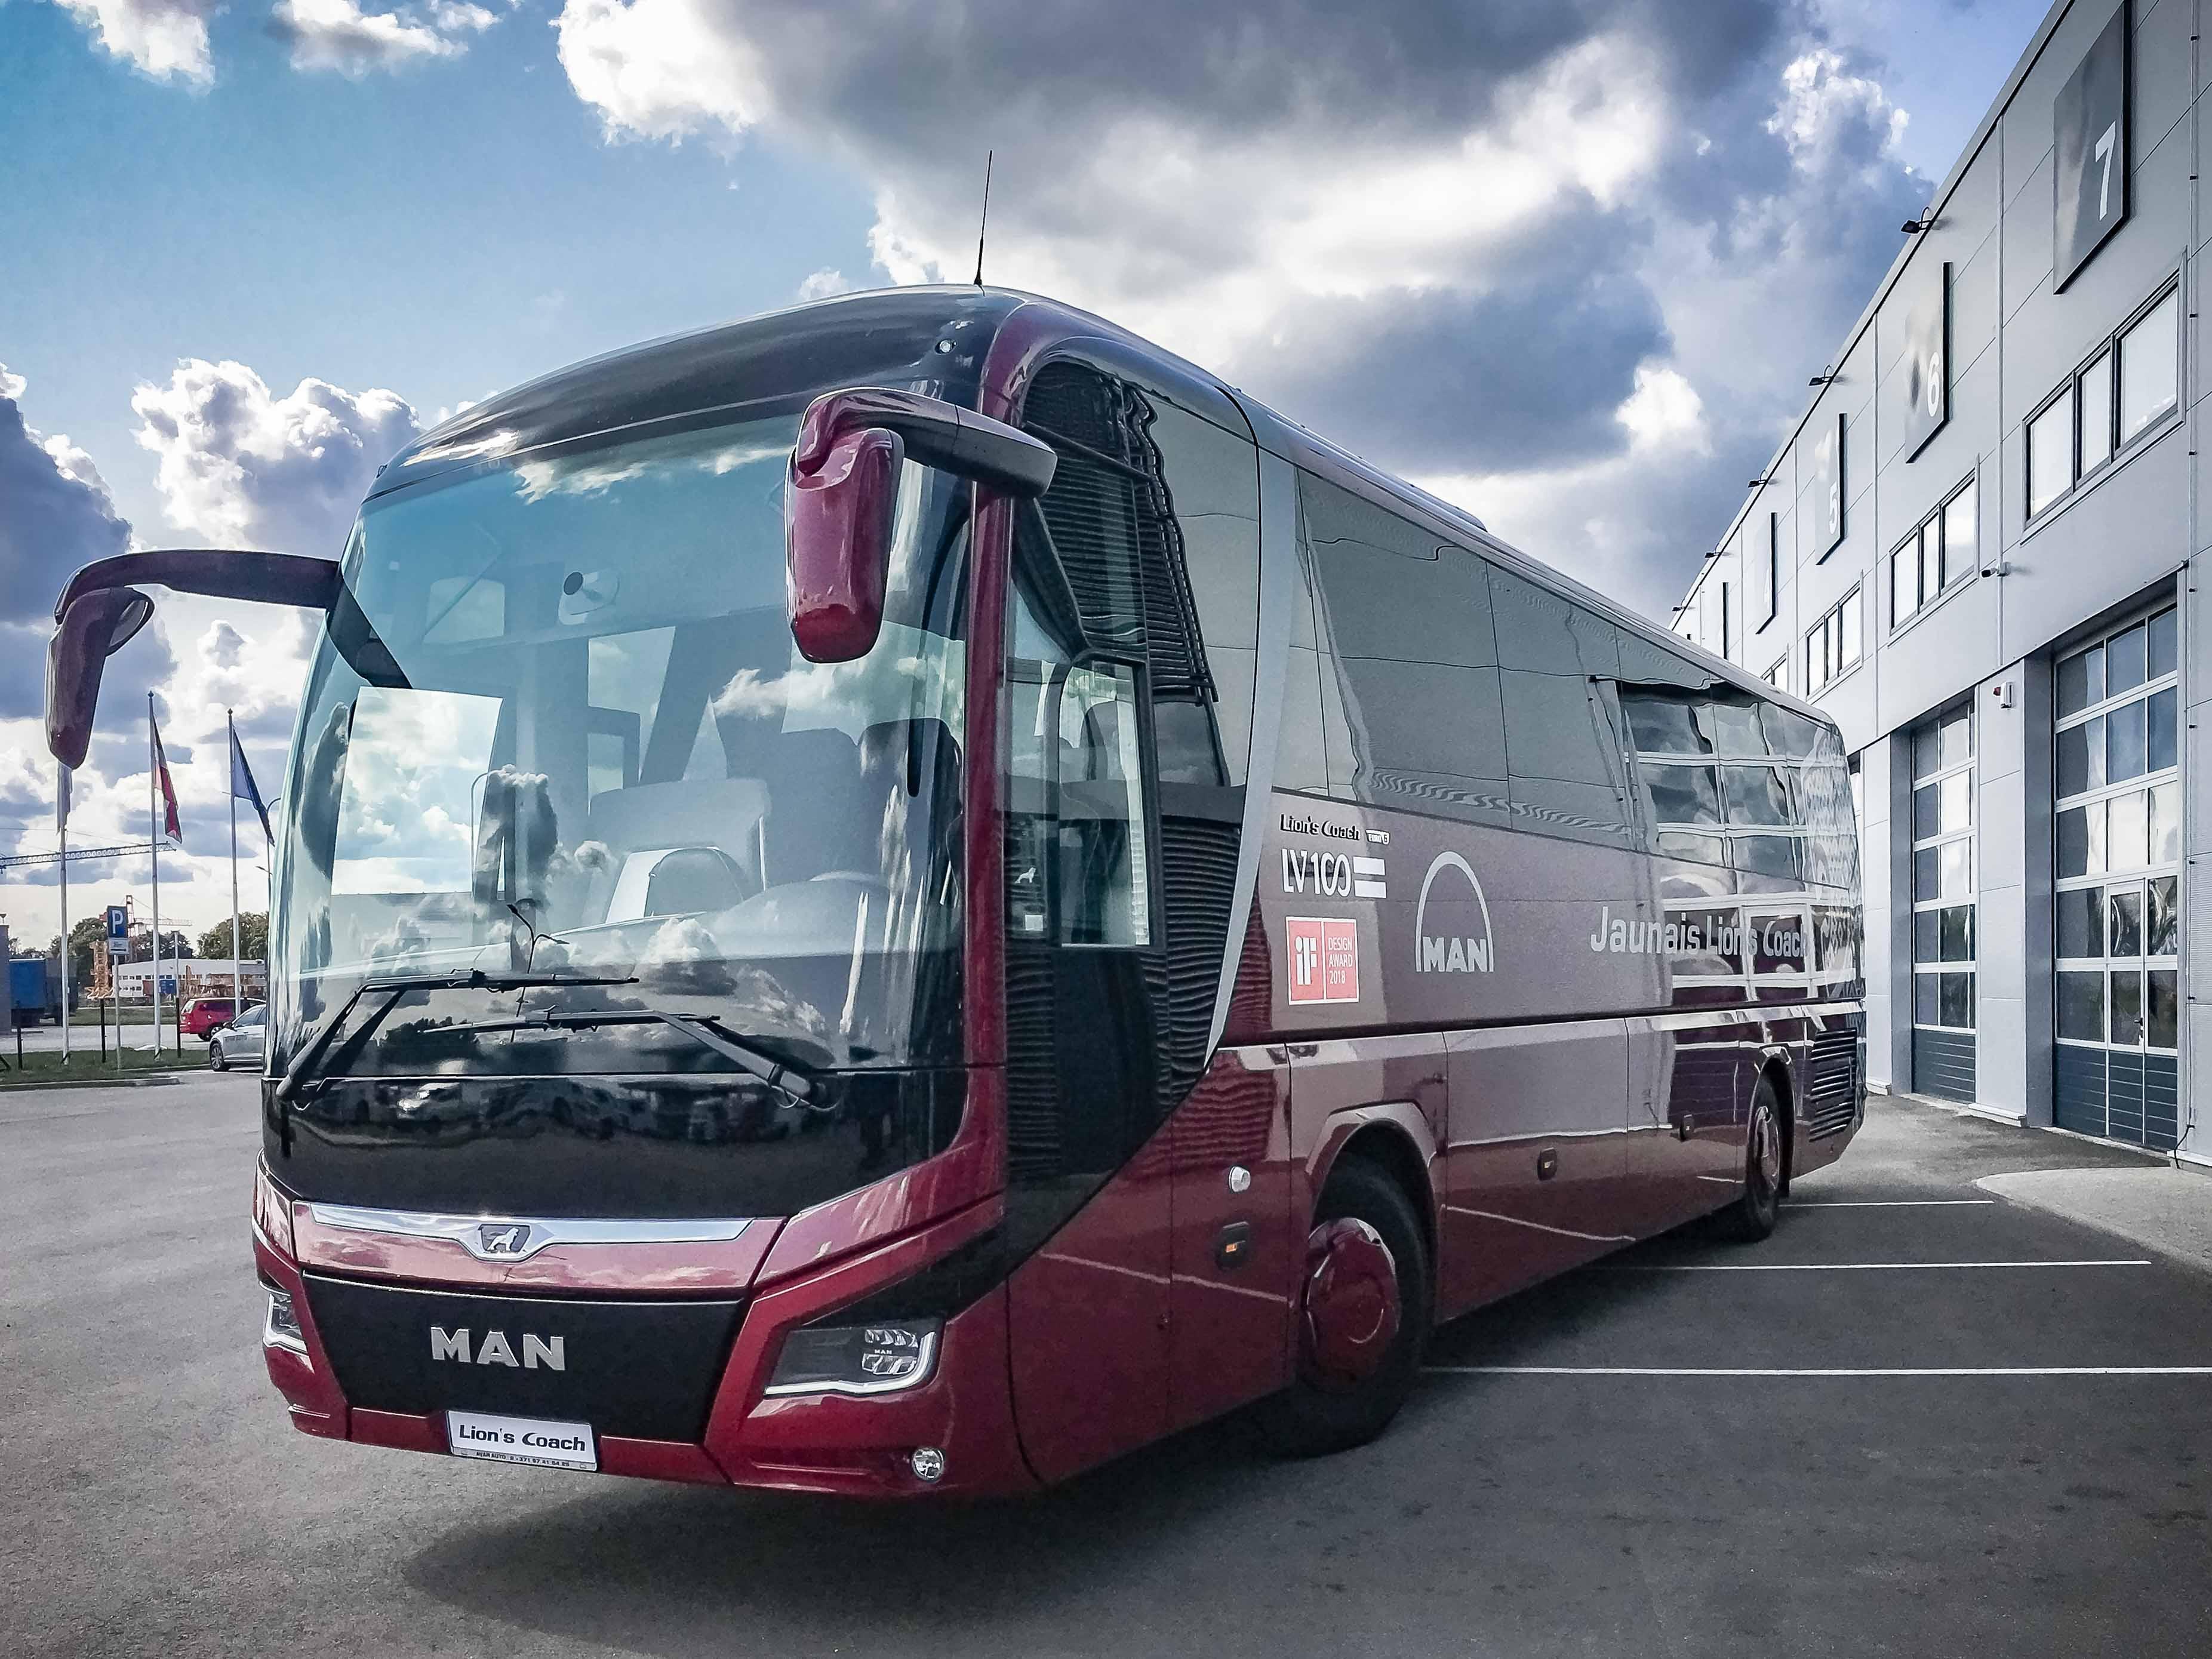 MAN concern creates bus dedicated to the 100th anniversary of Latvia